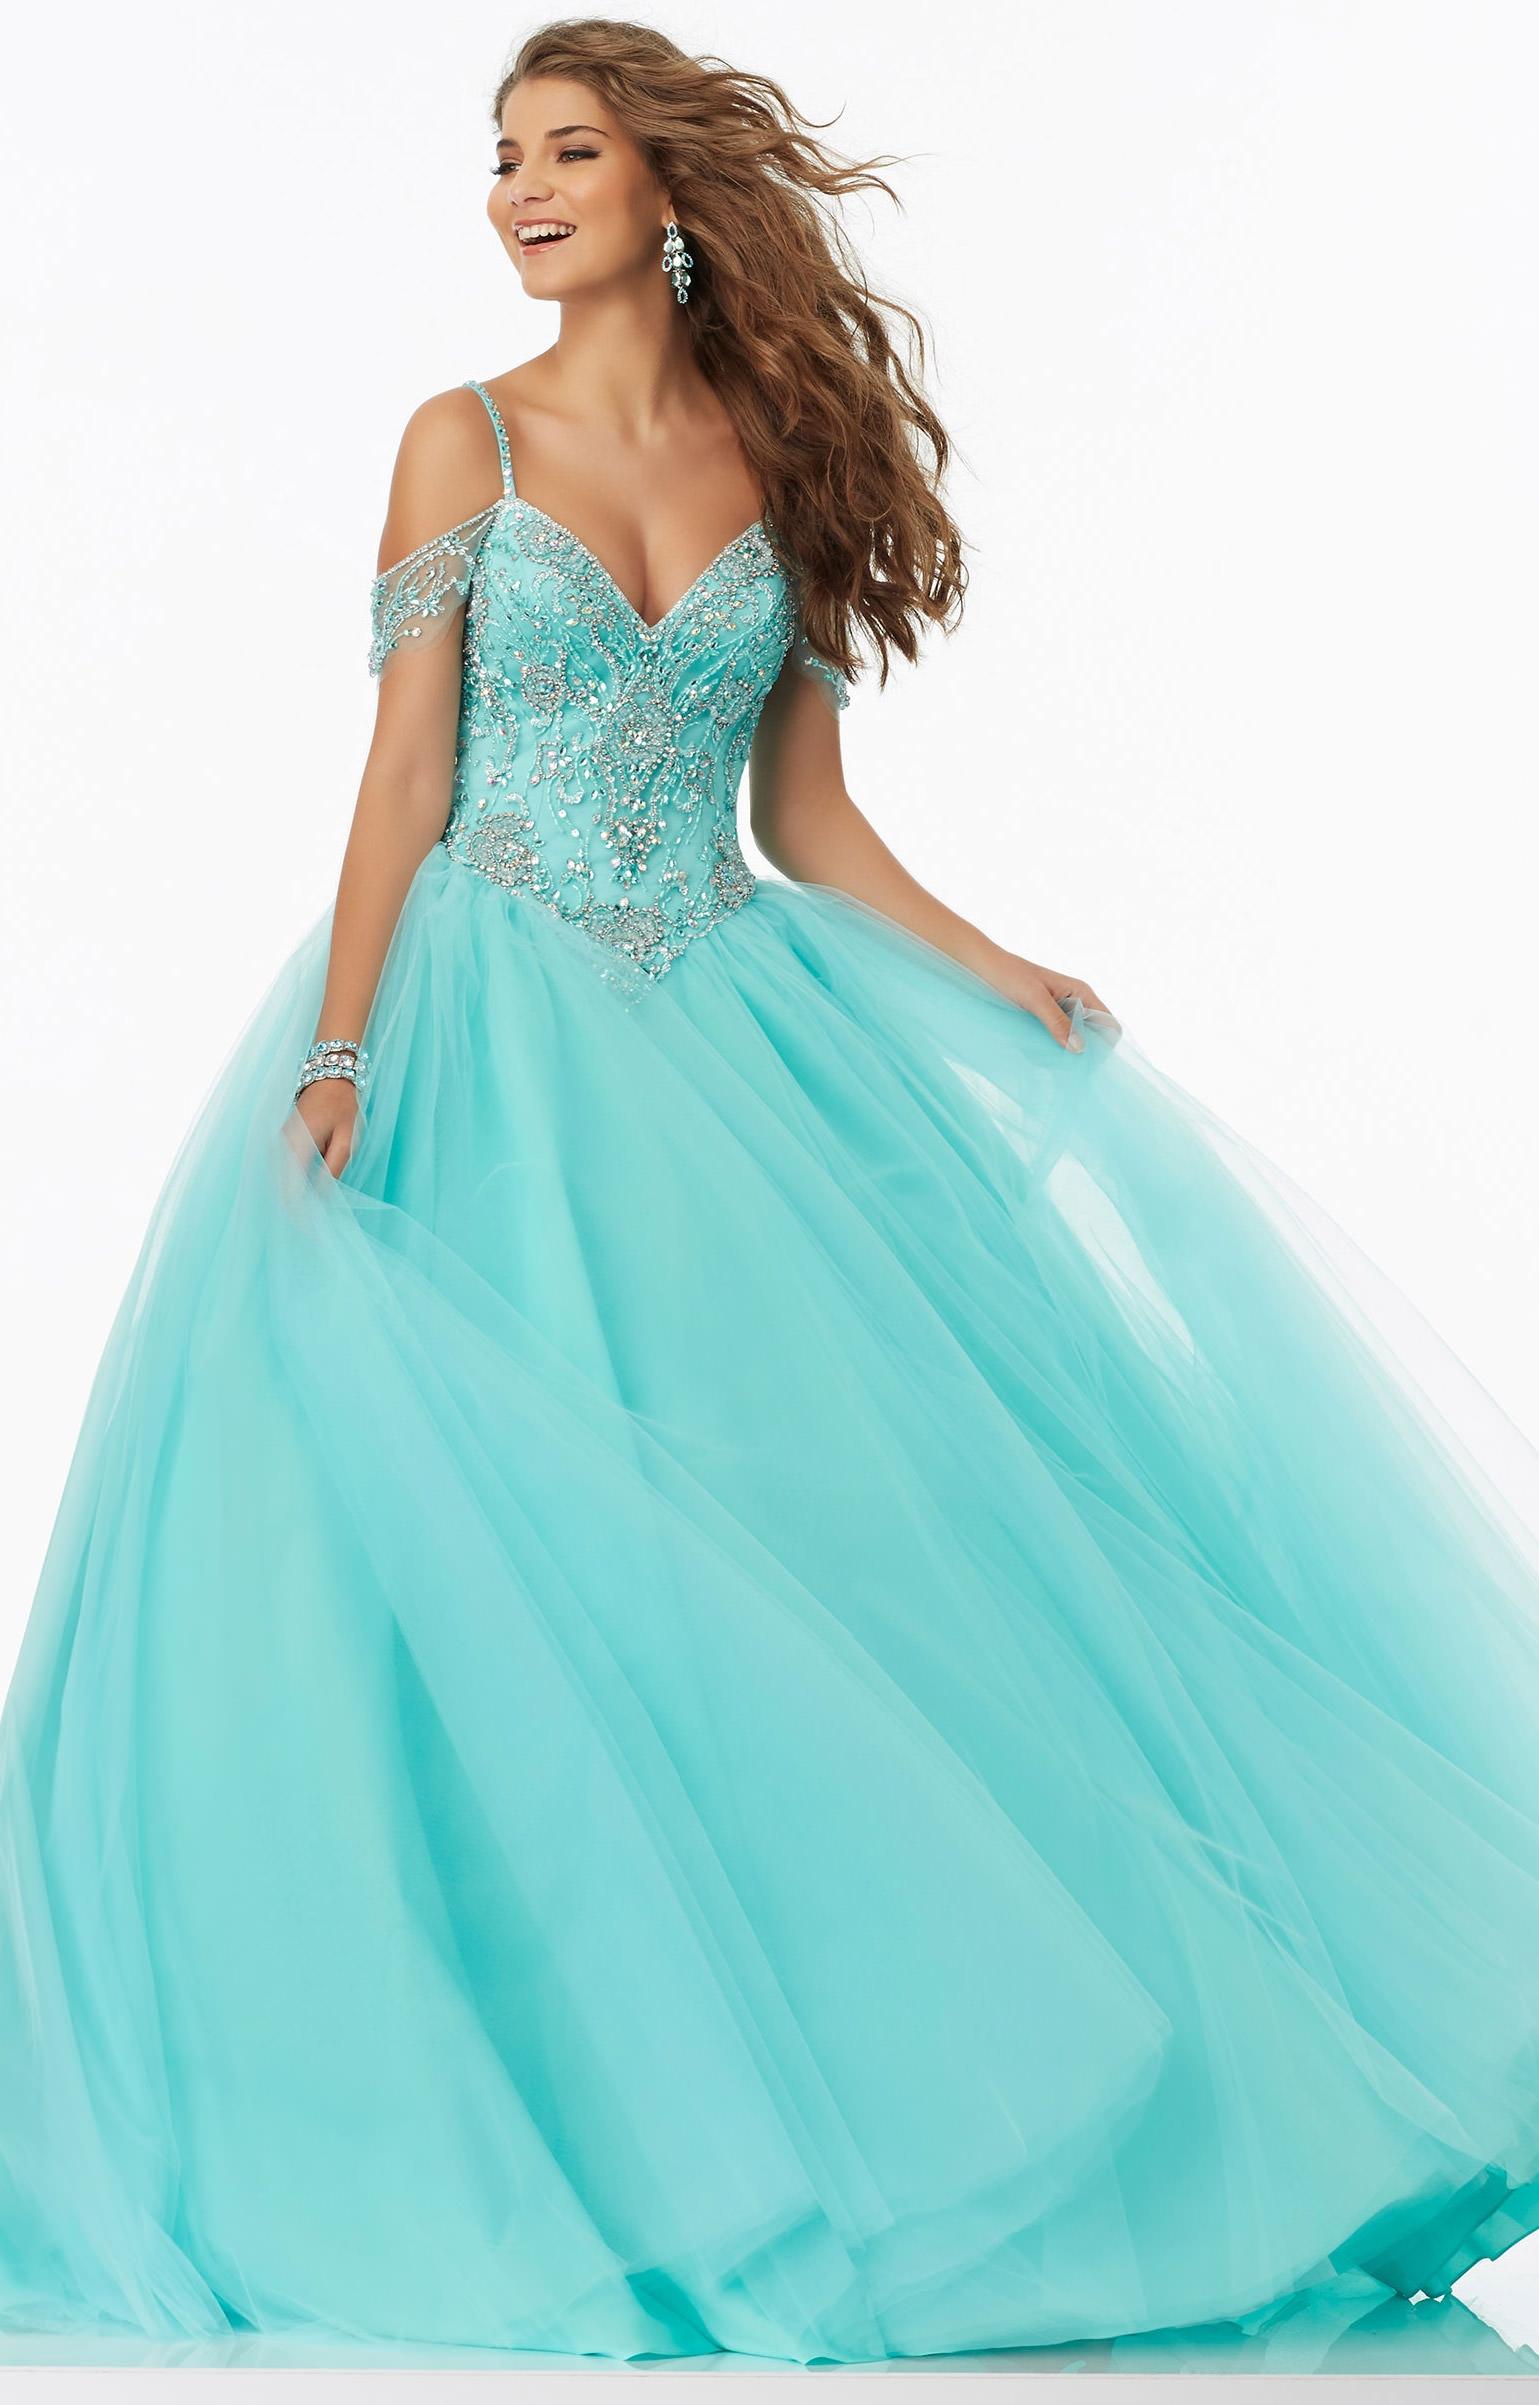 Mori Lee Prom 99040 - Formal Evening Prom Dress